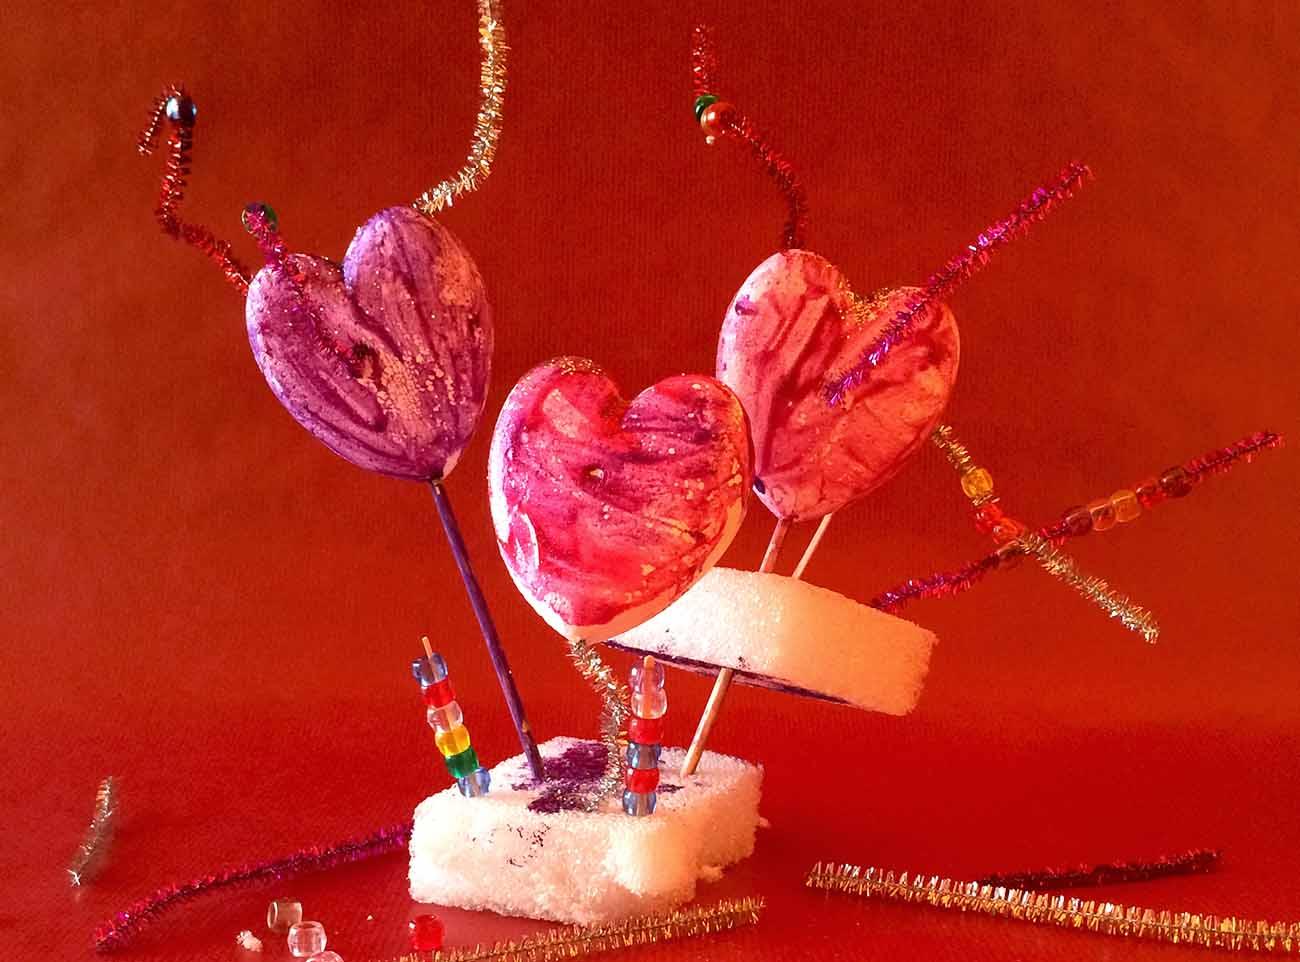 Five Minute Crafts: Free Form Valentine Sculpture for Kids